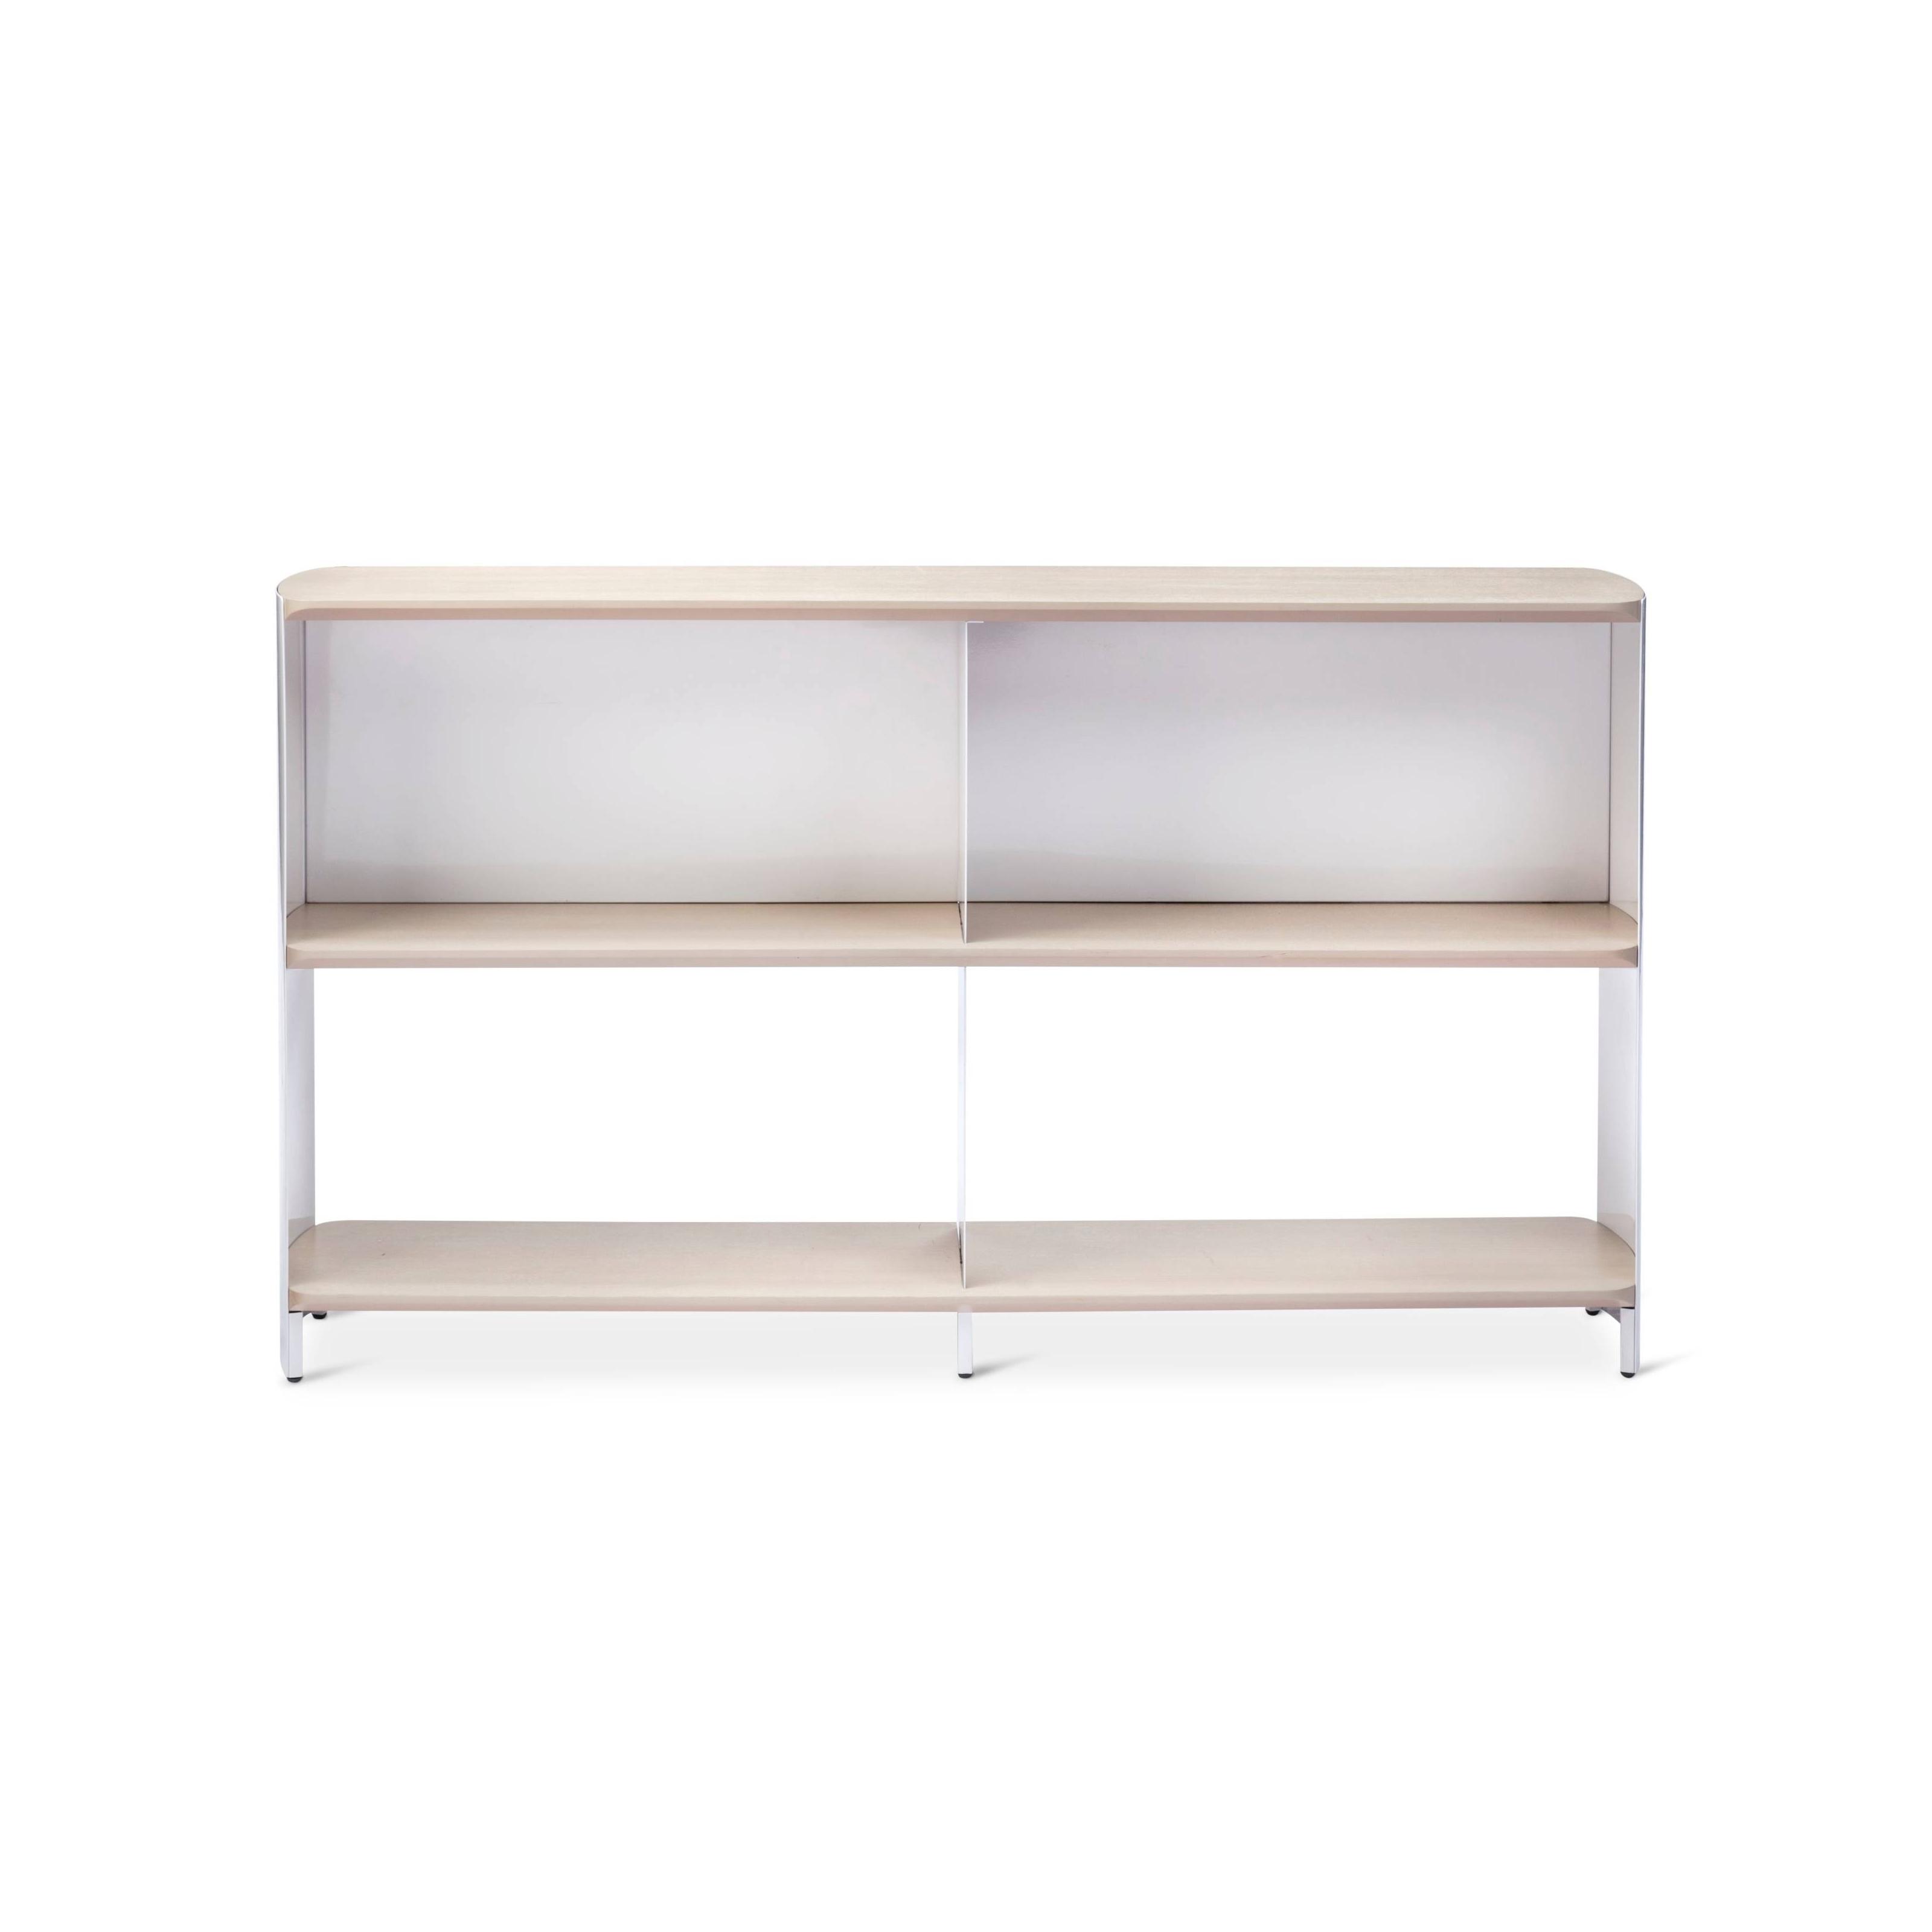 Modern By Dwell Magazine Bookshelf Wide White Natural